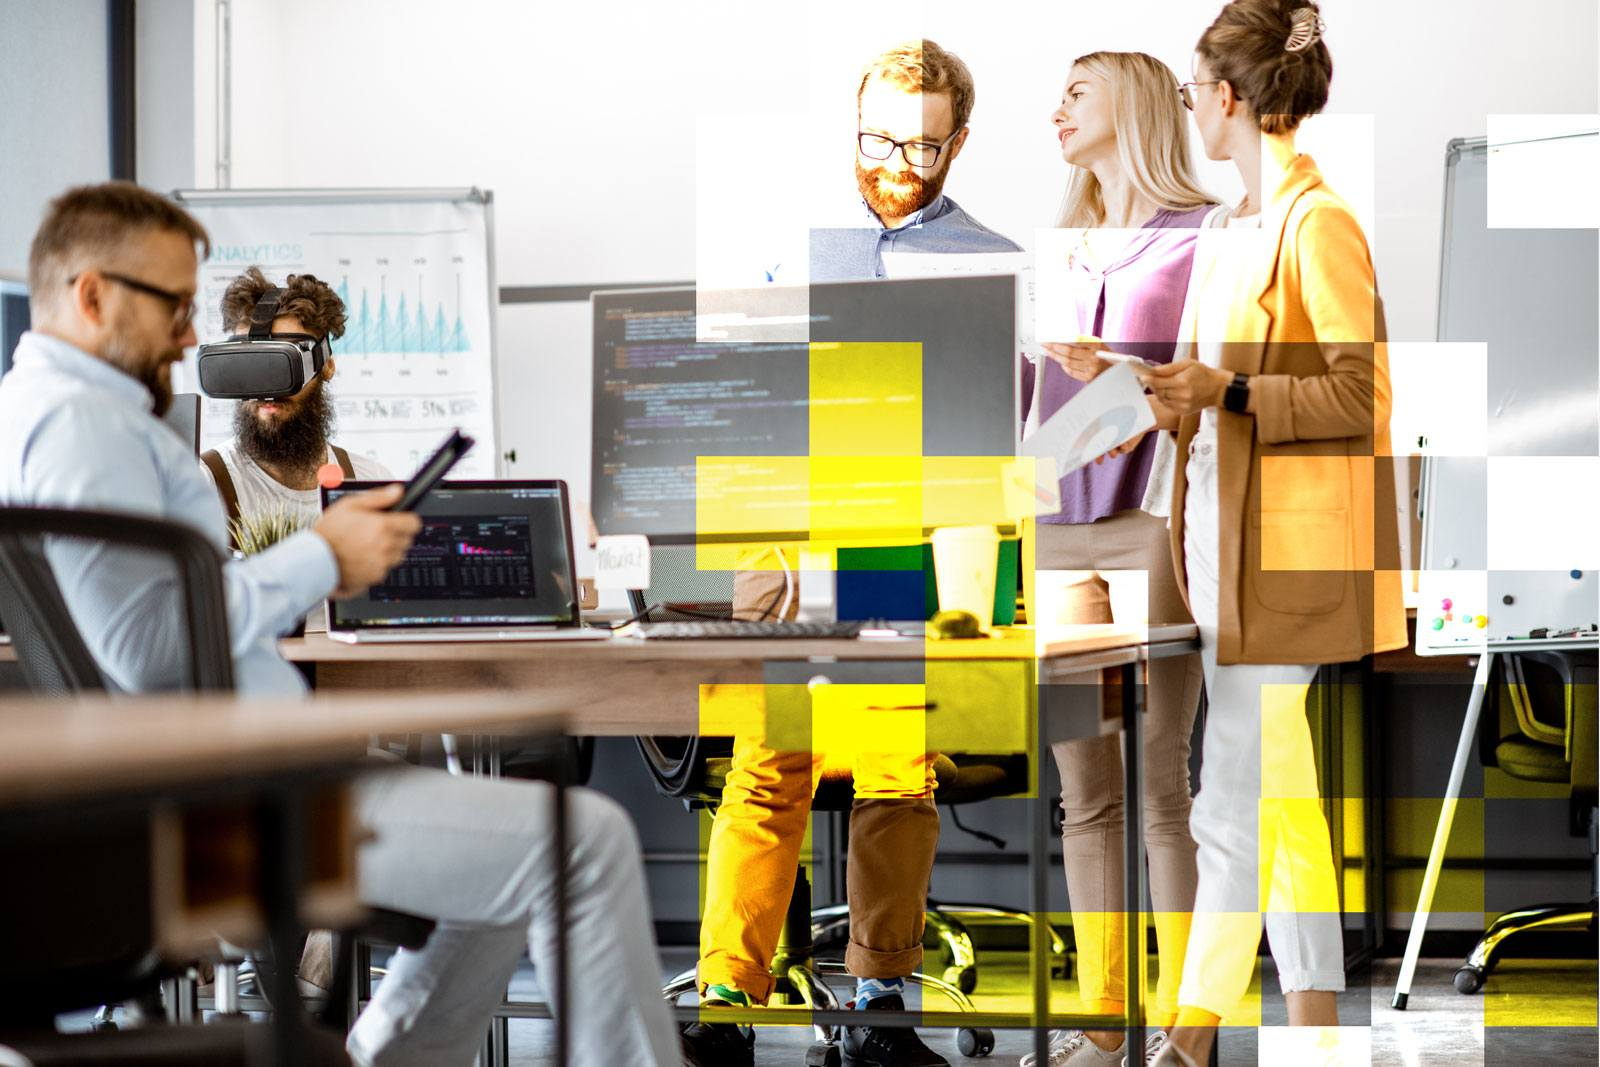 people-devops-pc-hololens-augmentedreality-office